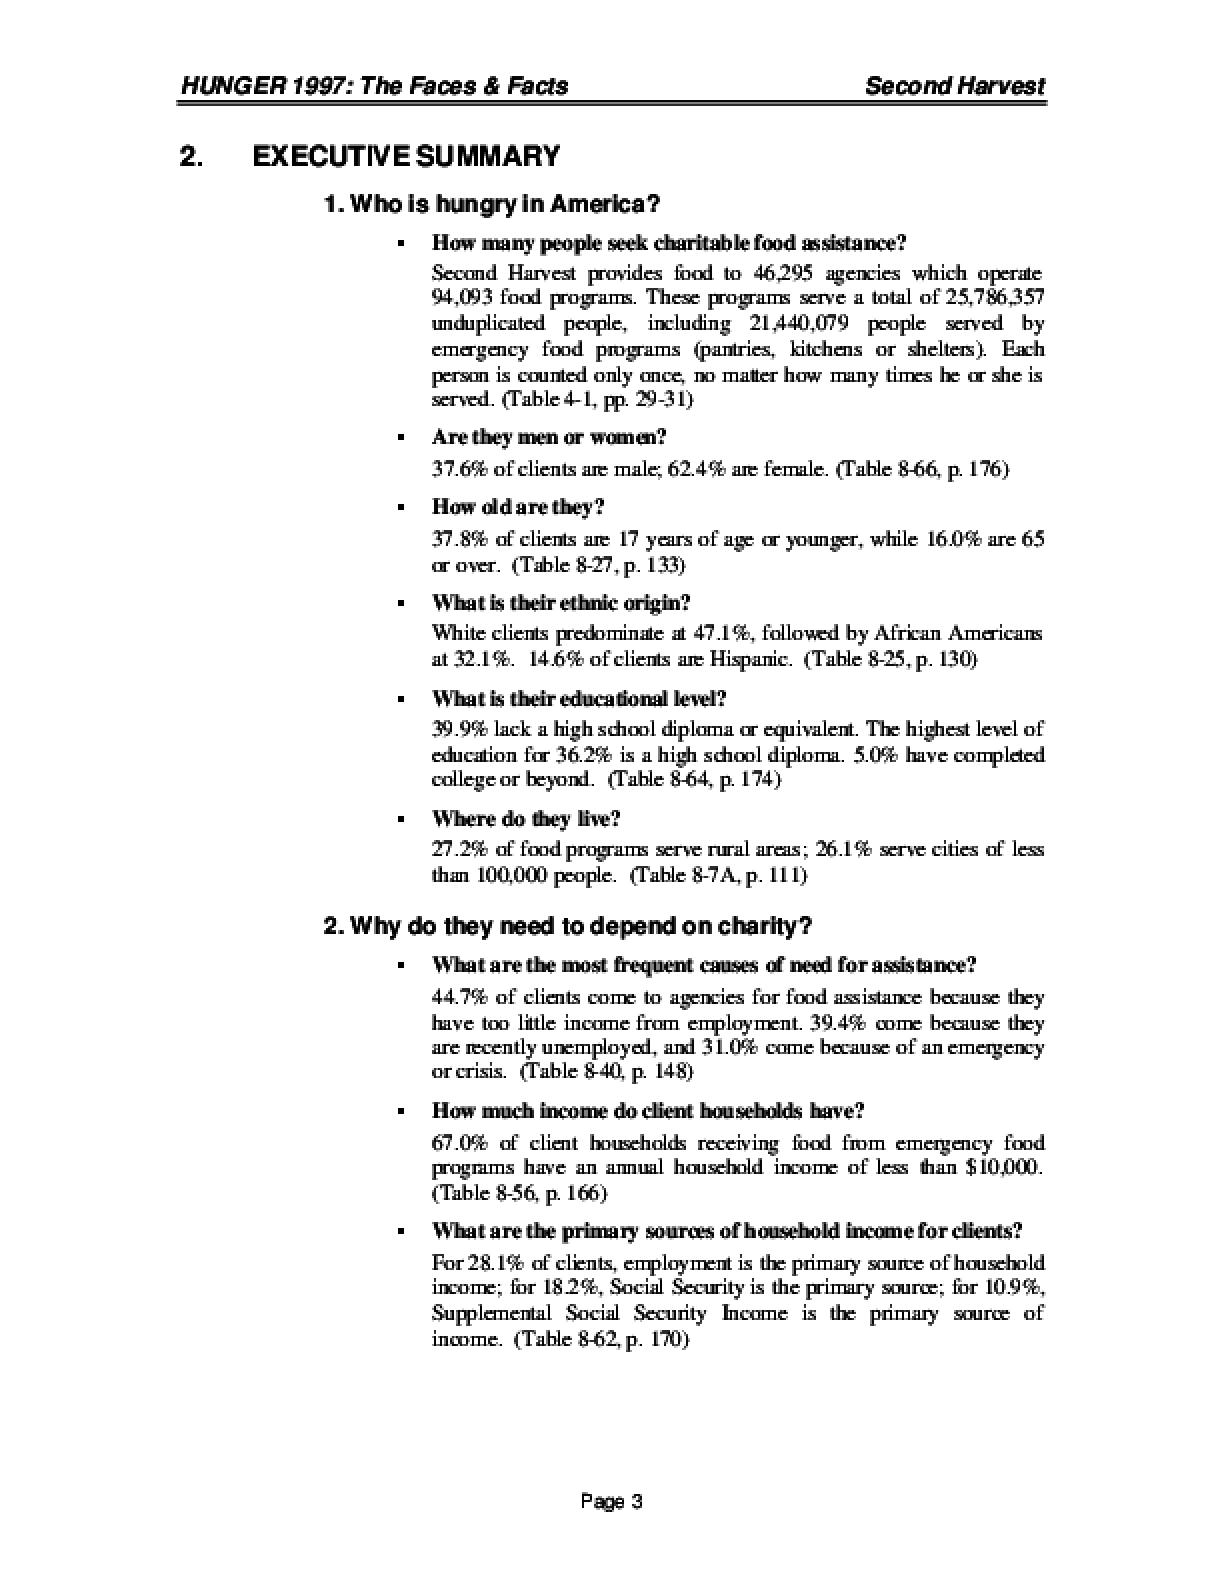 Hunger Study 1997